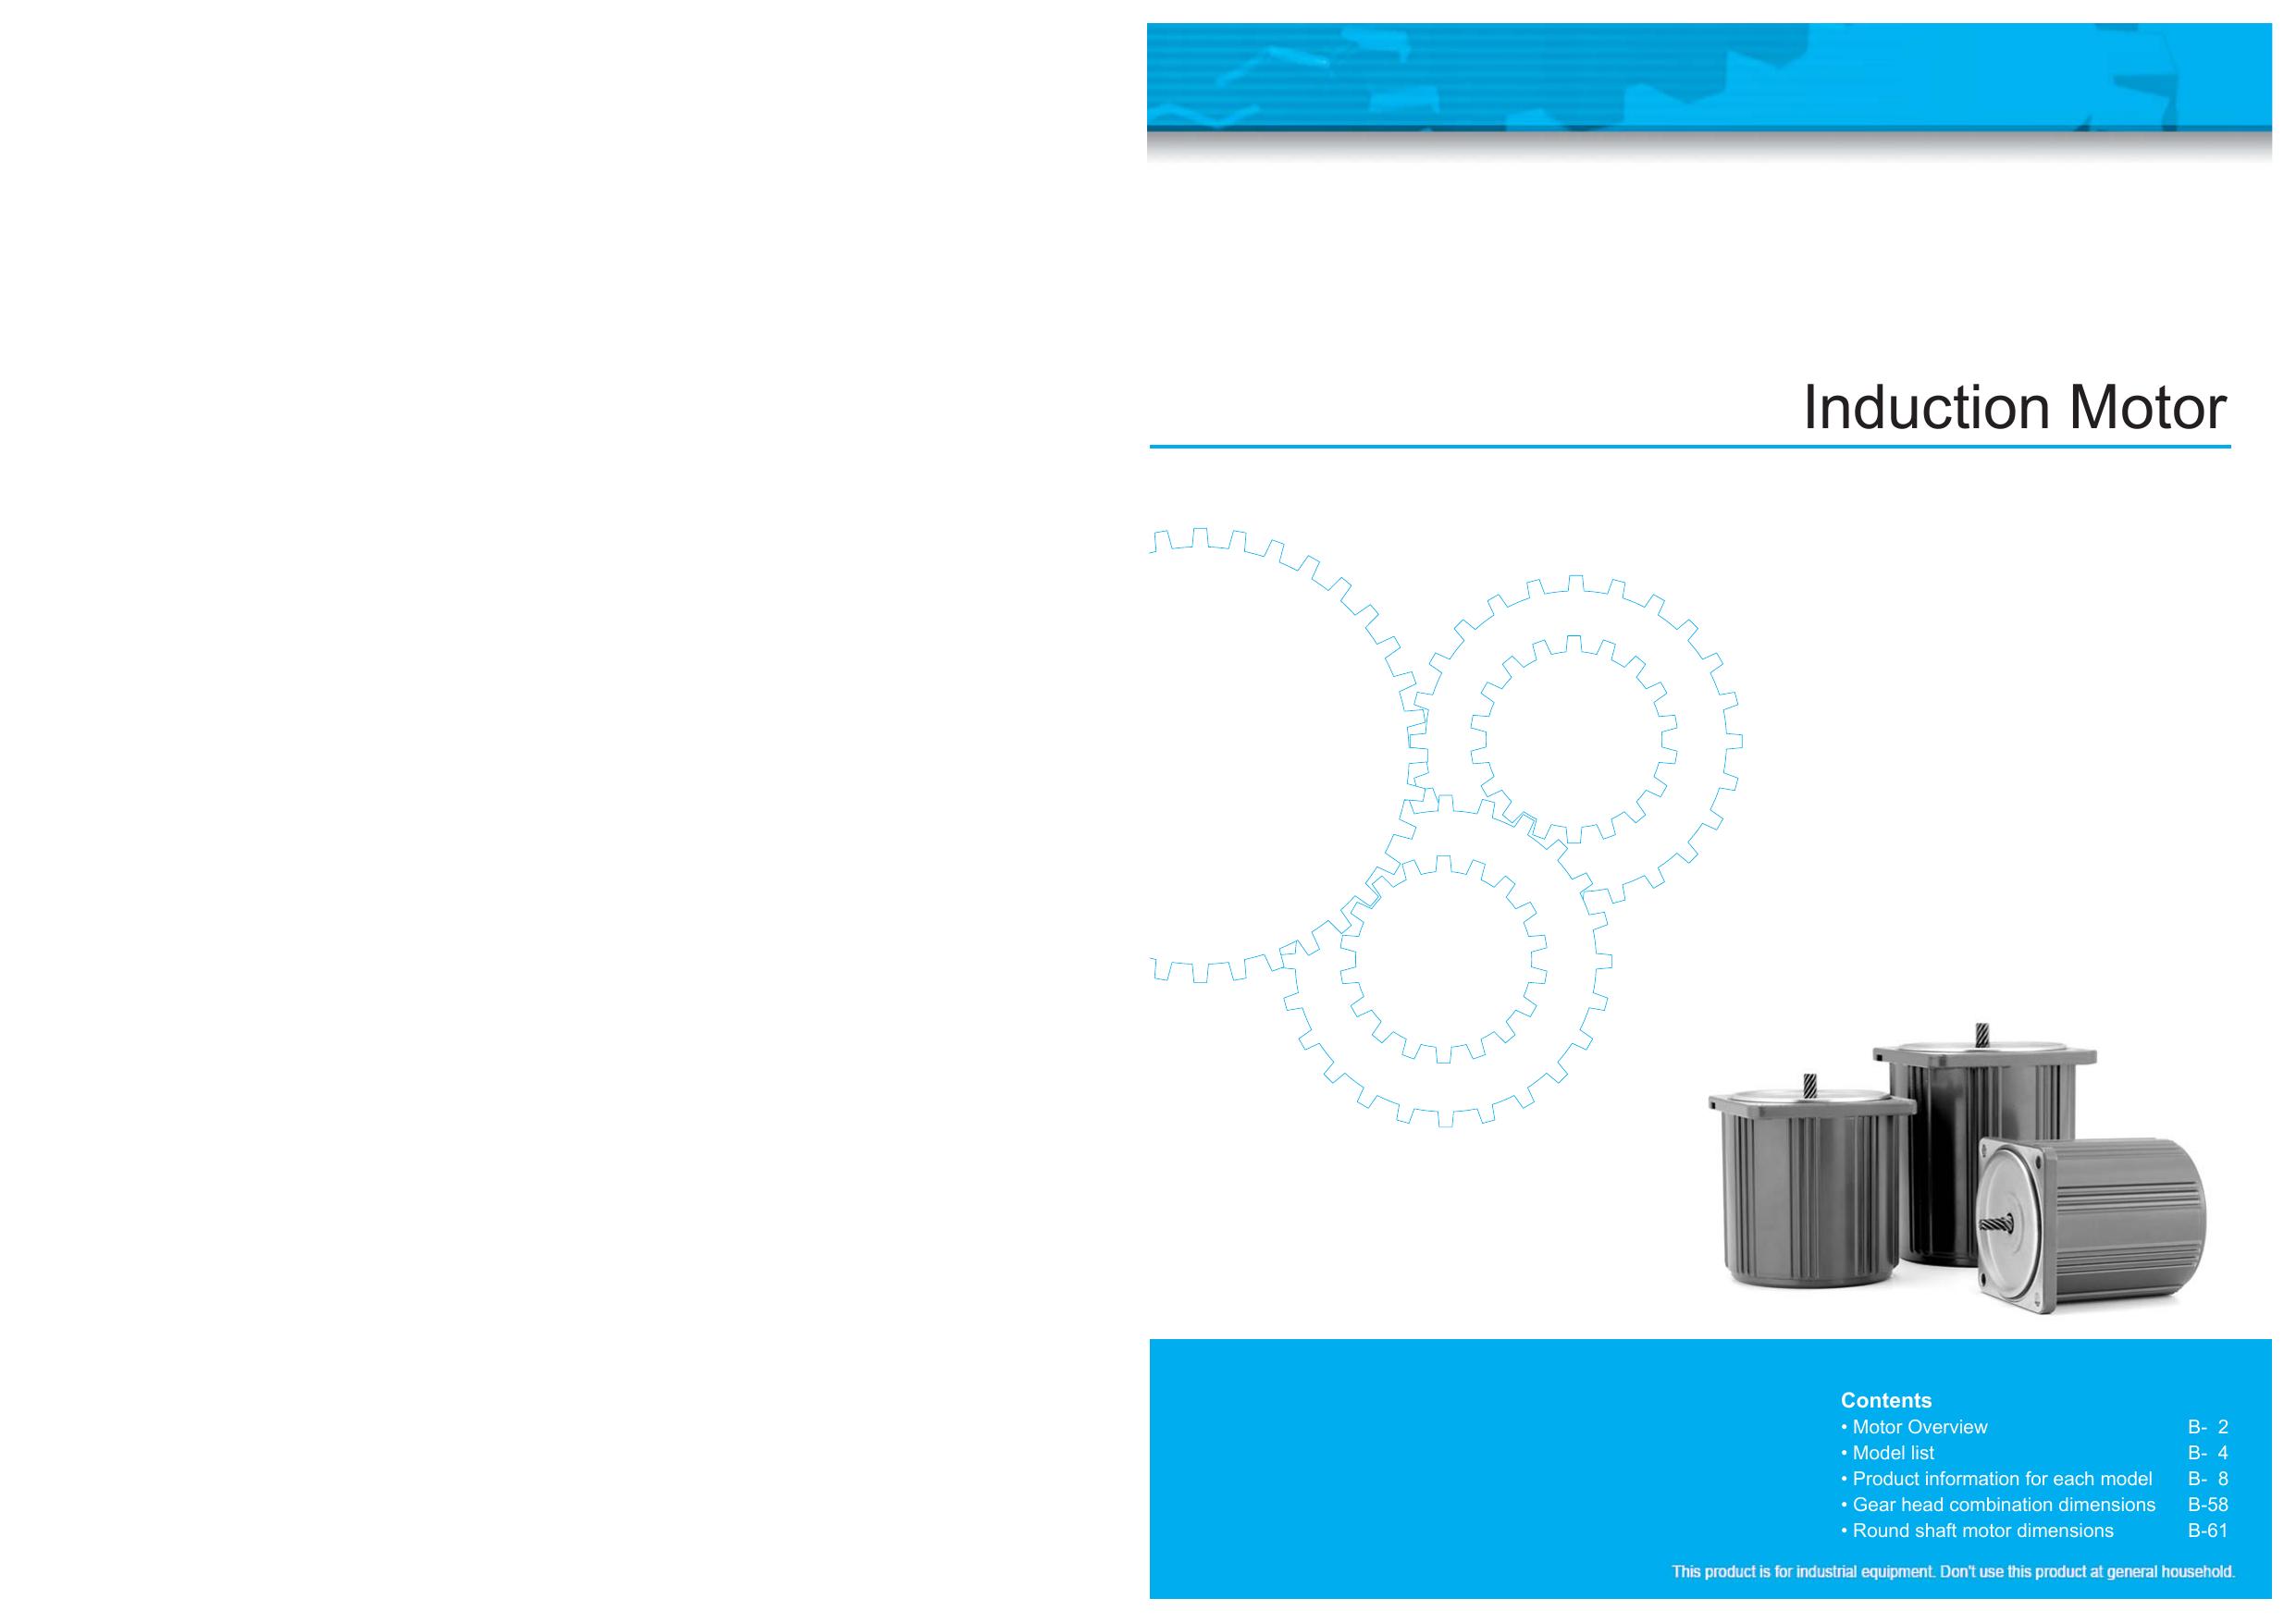 Induction Motor. 01843301014da41ee719c5f537e431d06373026dfa. Wiring. Wire Diagram Capacitor B384 At Scoala.co